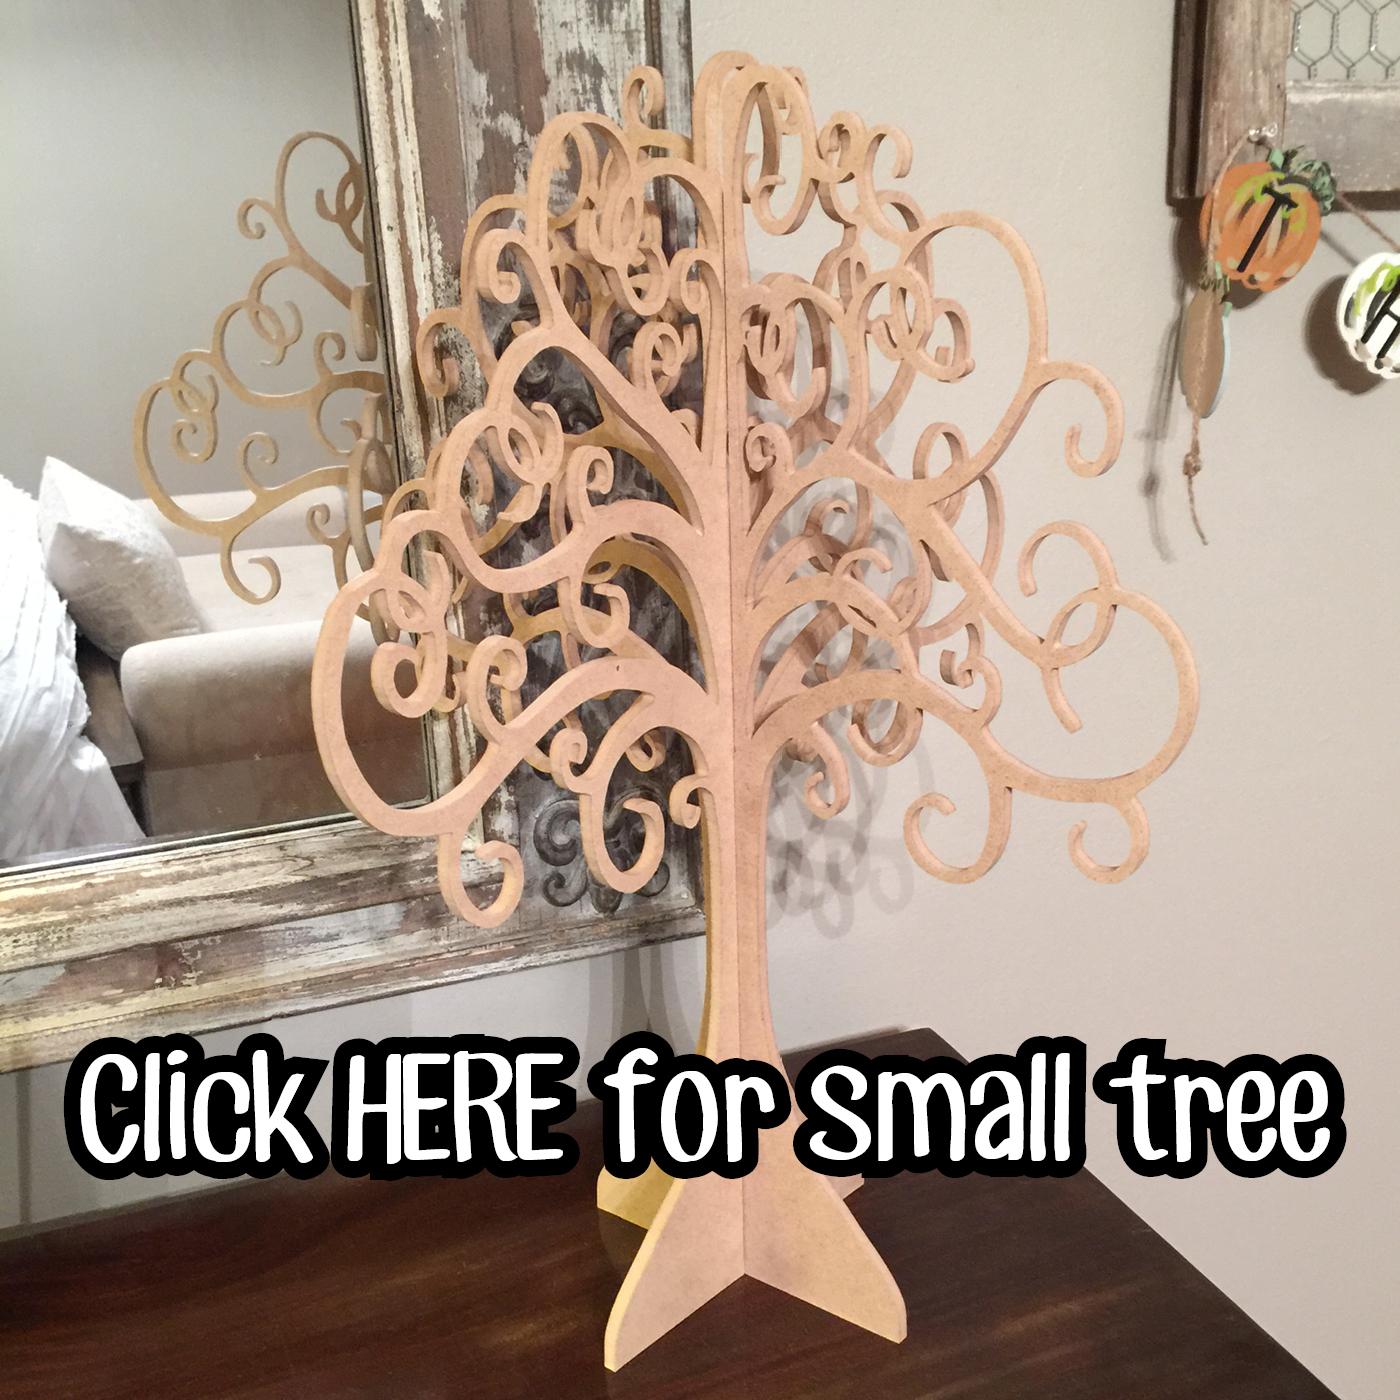 small-tree-click-here.jpg